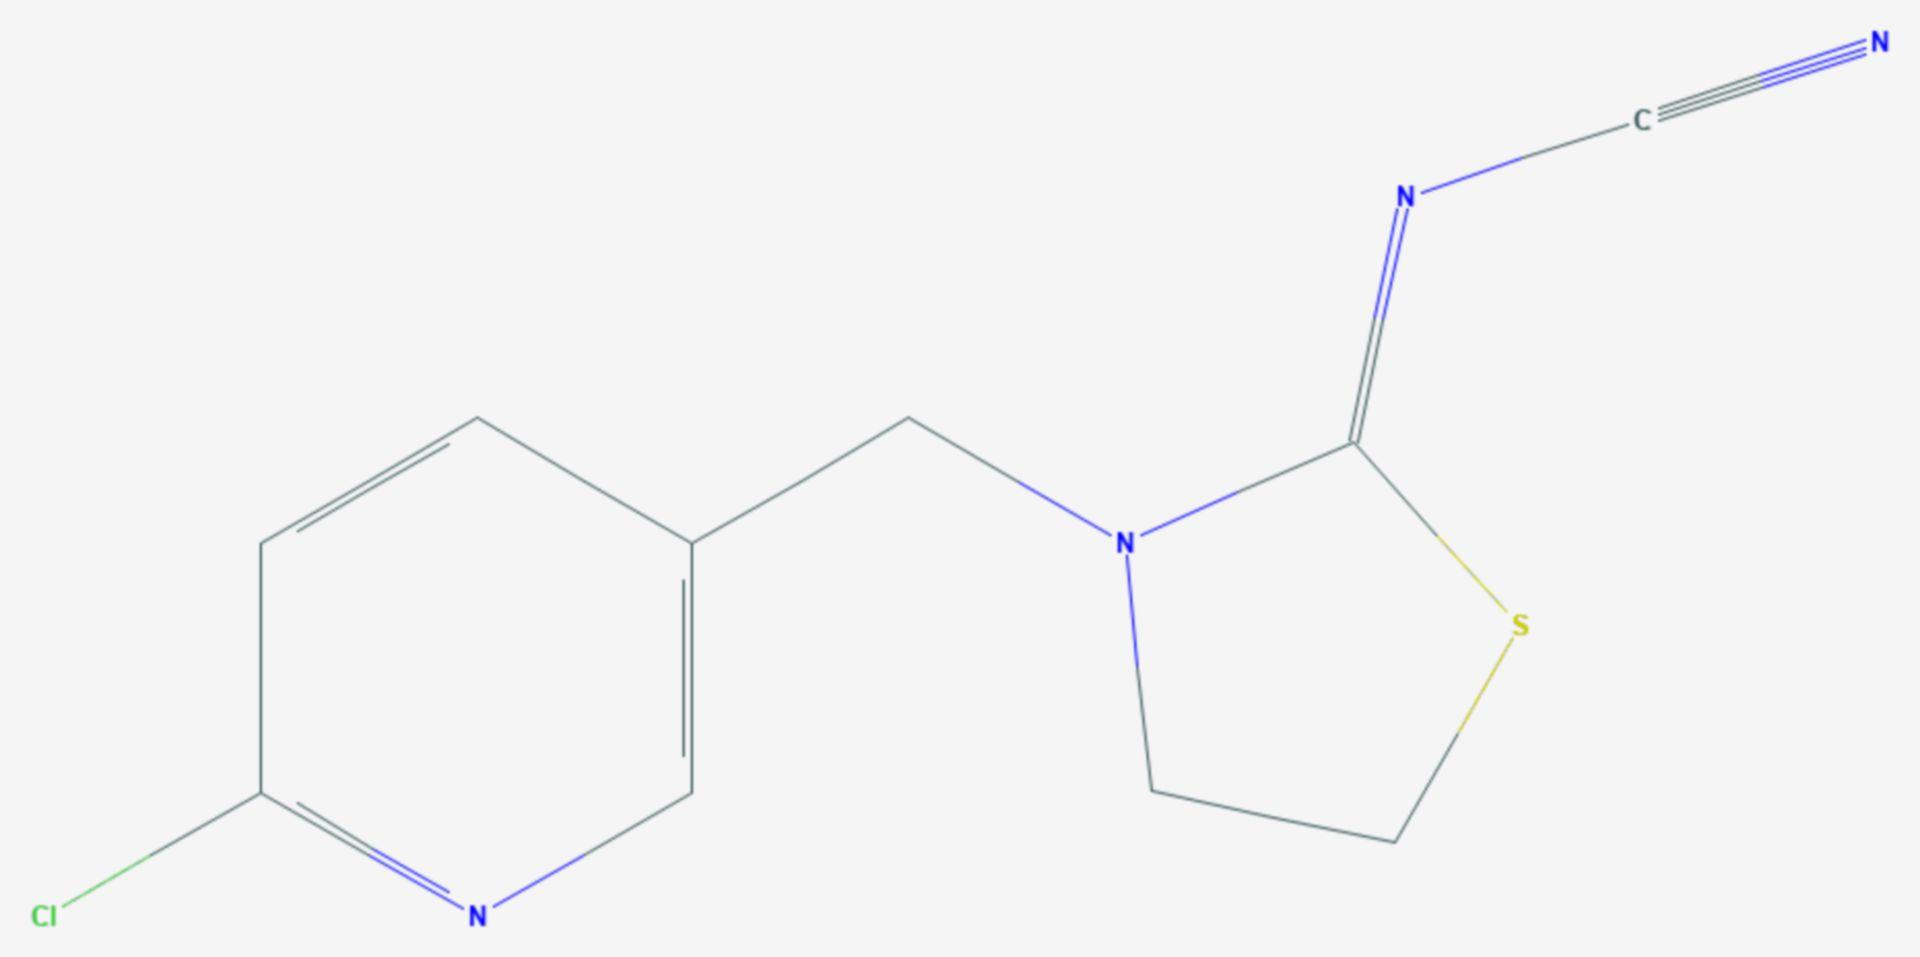 Thiacloprid (Strukturformel)